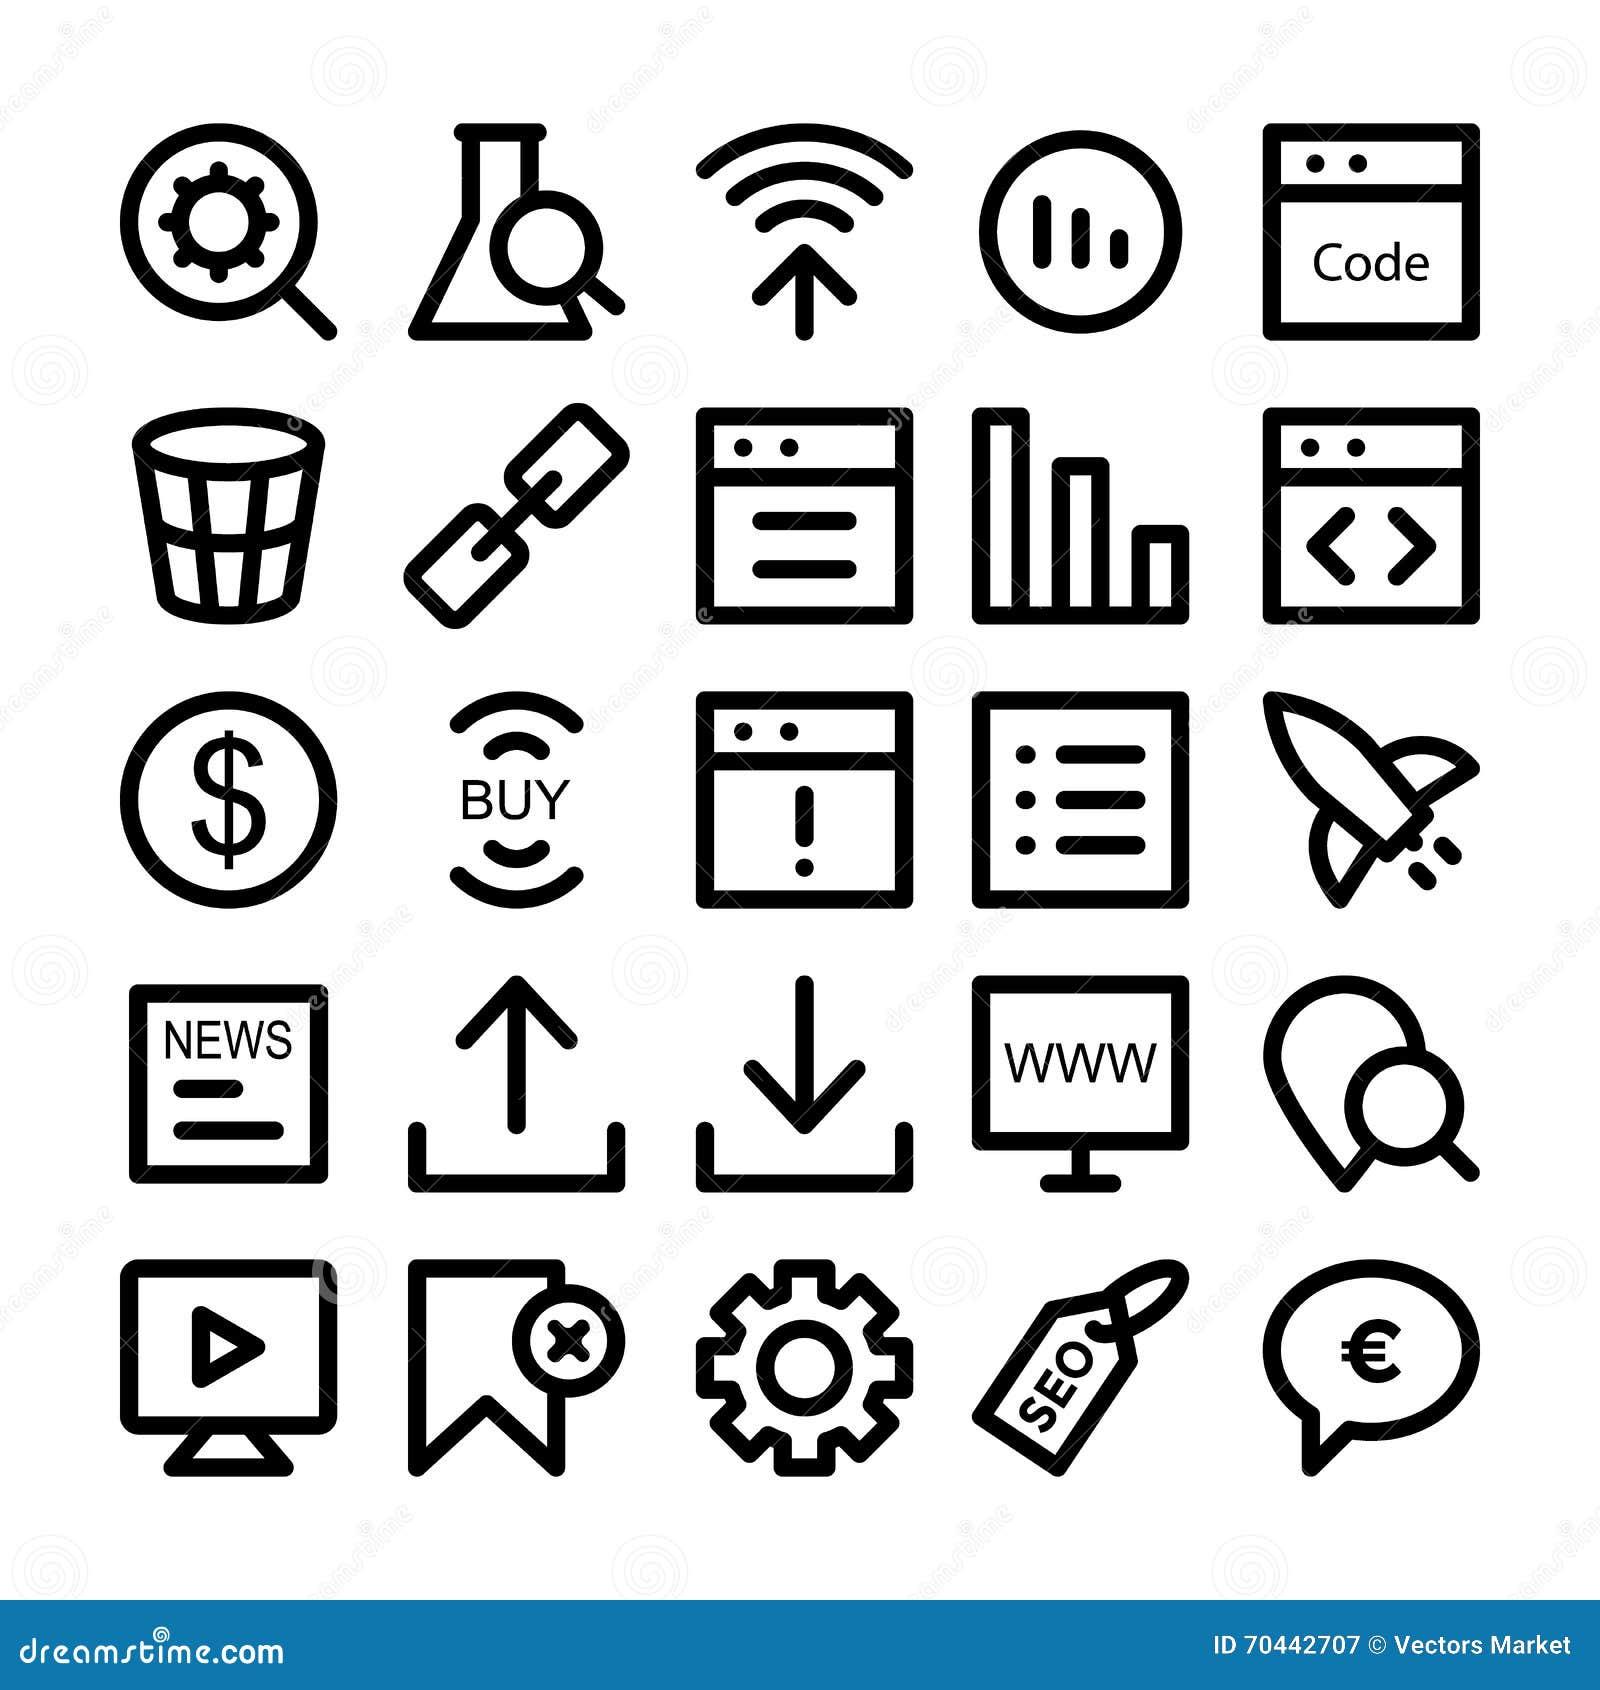 seo and marketing icons 5 stock illustration